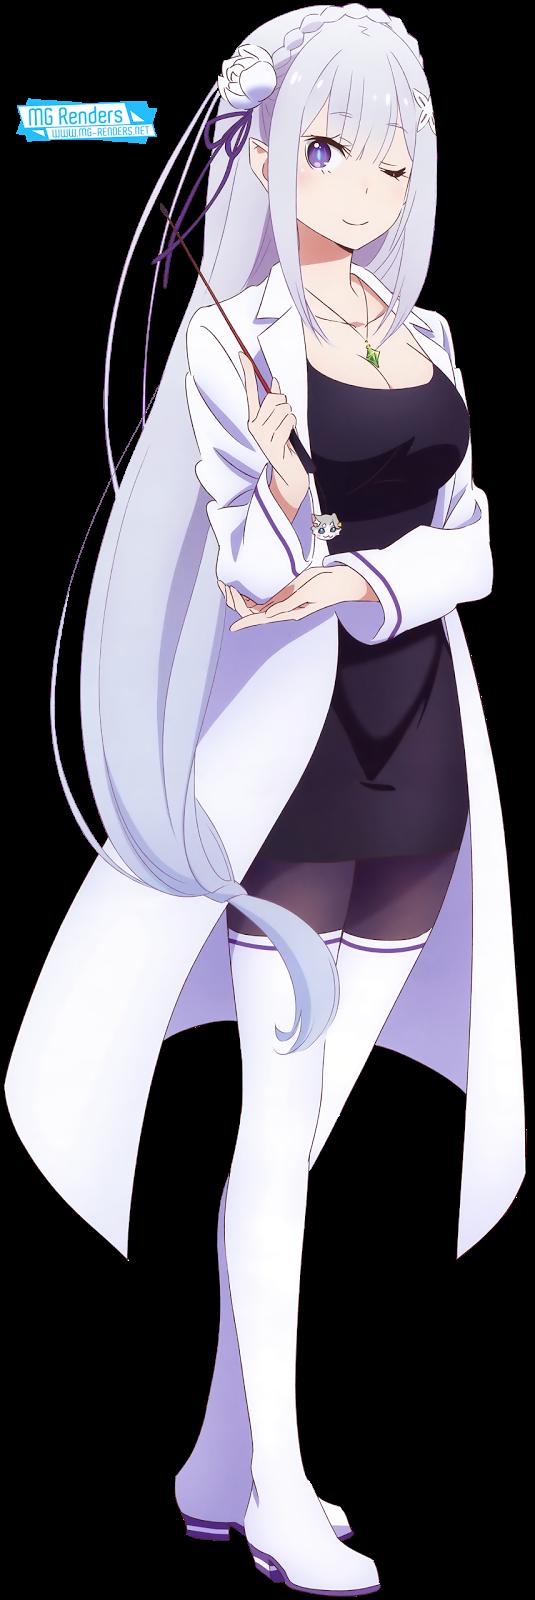 Tags: Anime, Render,  Dress,  Elf,  Emilia,  Full body,  Re Zero Kara Hajimeru Isekai Seikatsu,  PNG, Image, Picture